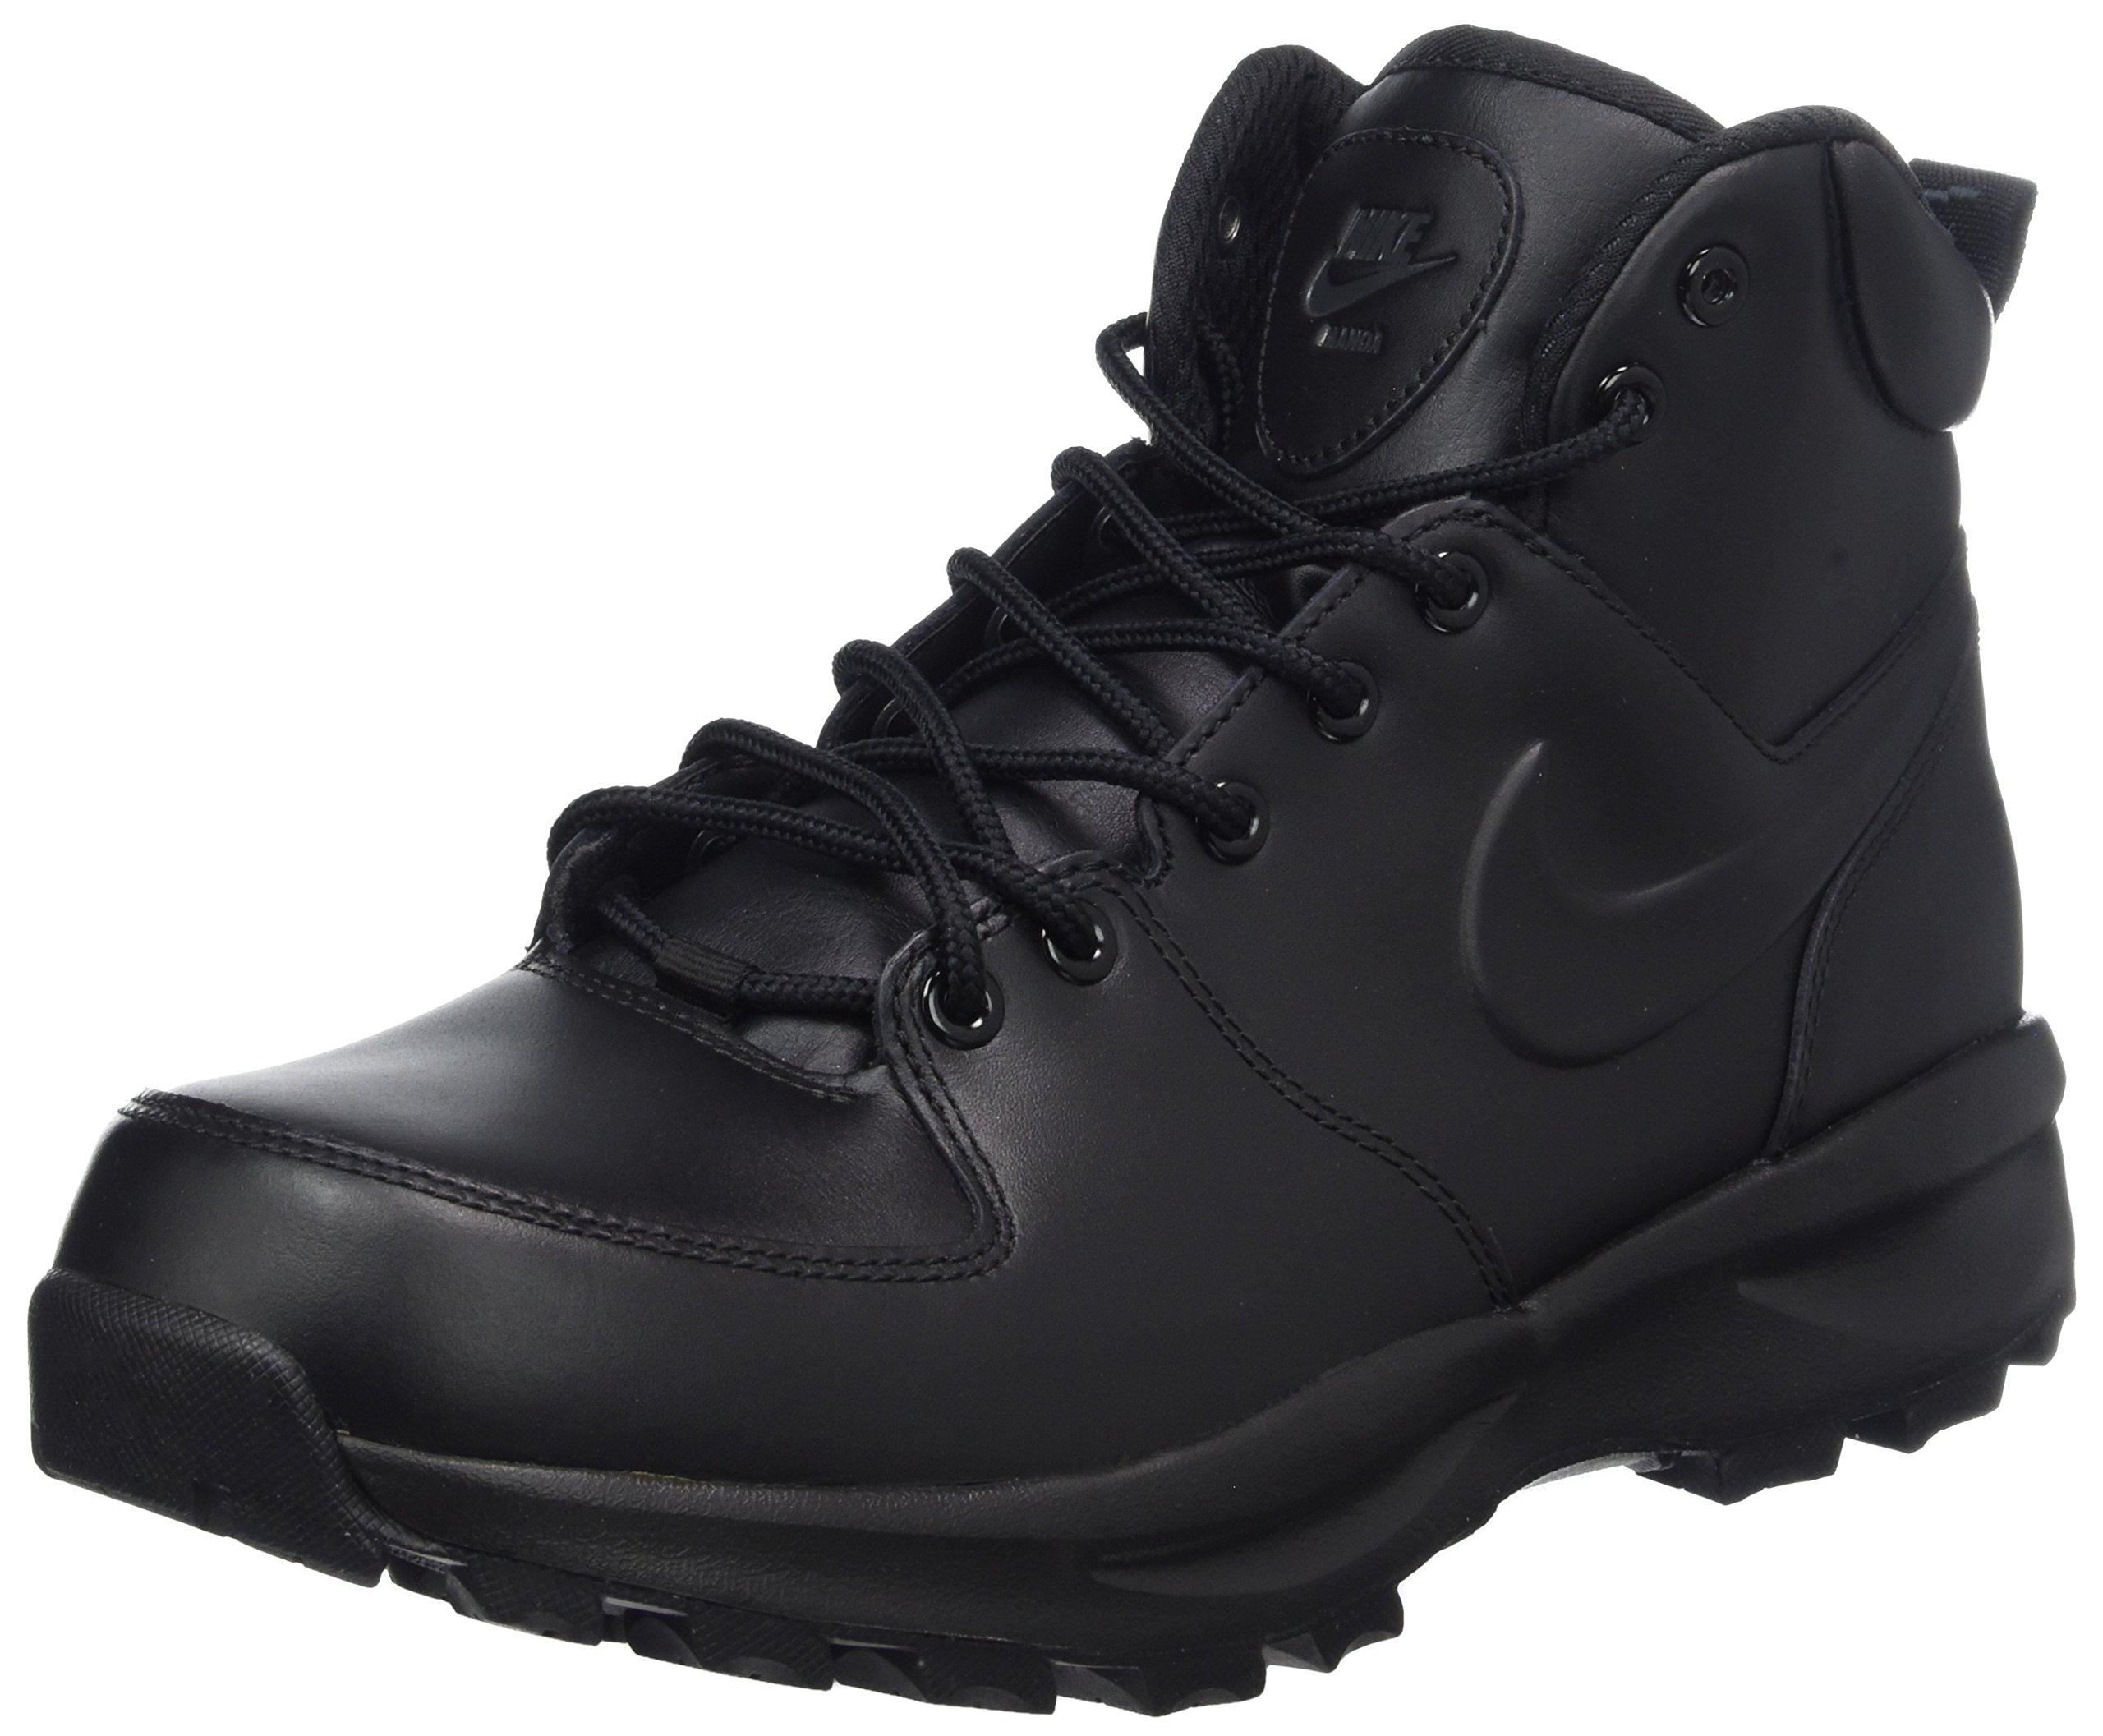 Nike Men's Manoa Leather Black/Black/Black Boot 11 Men US by Nike